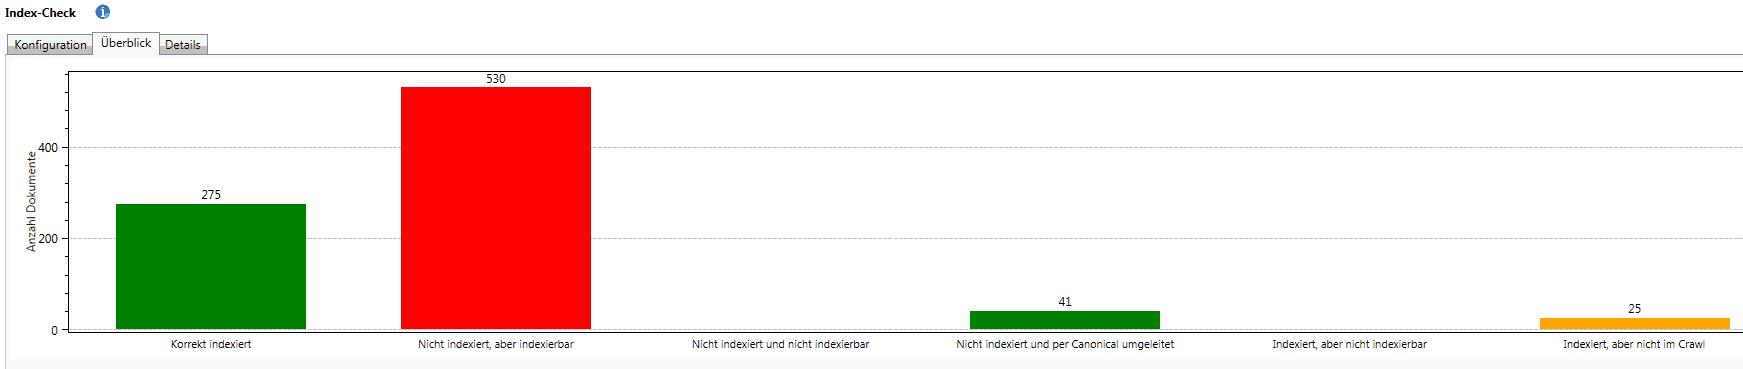 Index Check Auswertung